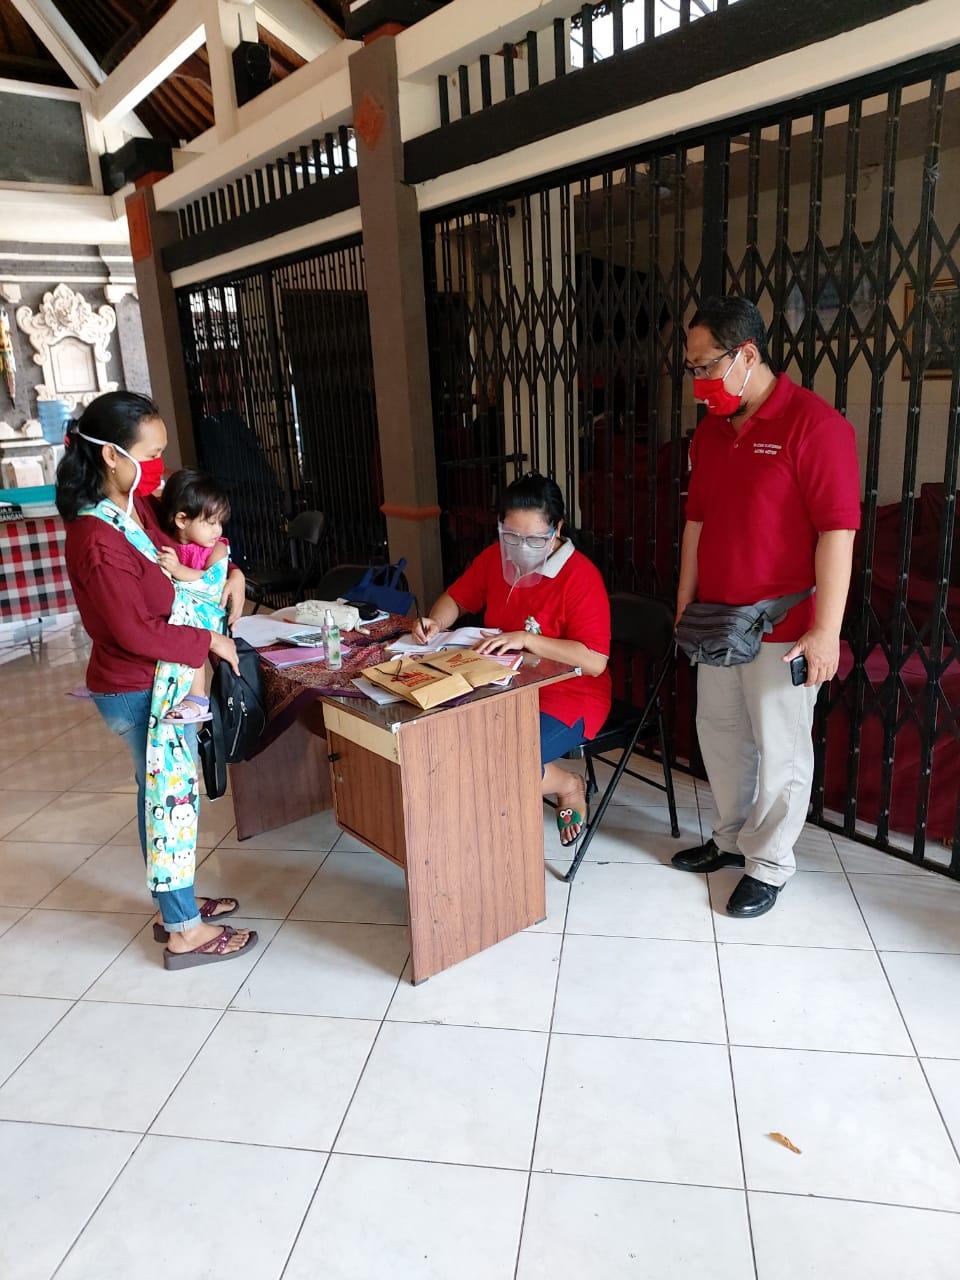 PELAKSANAAN posyandu di Banjar Tegeh Sari, Kelurahan Tonja, Kota Denpasar beberapa waktu lalu. Foto: ist